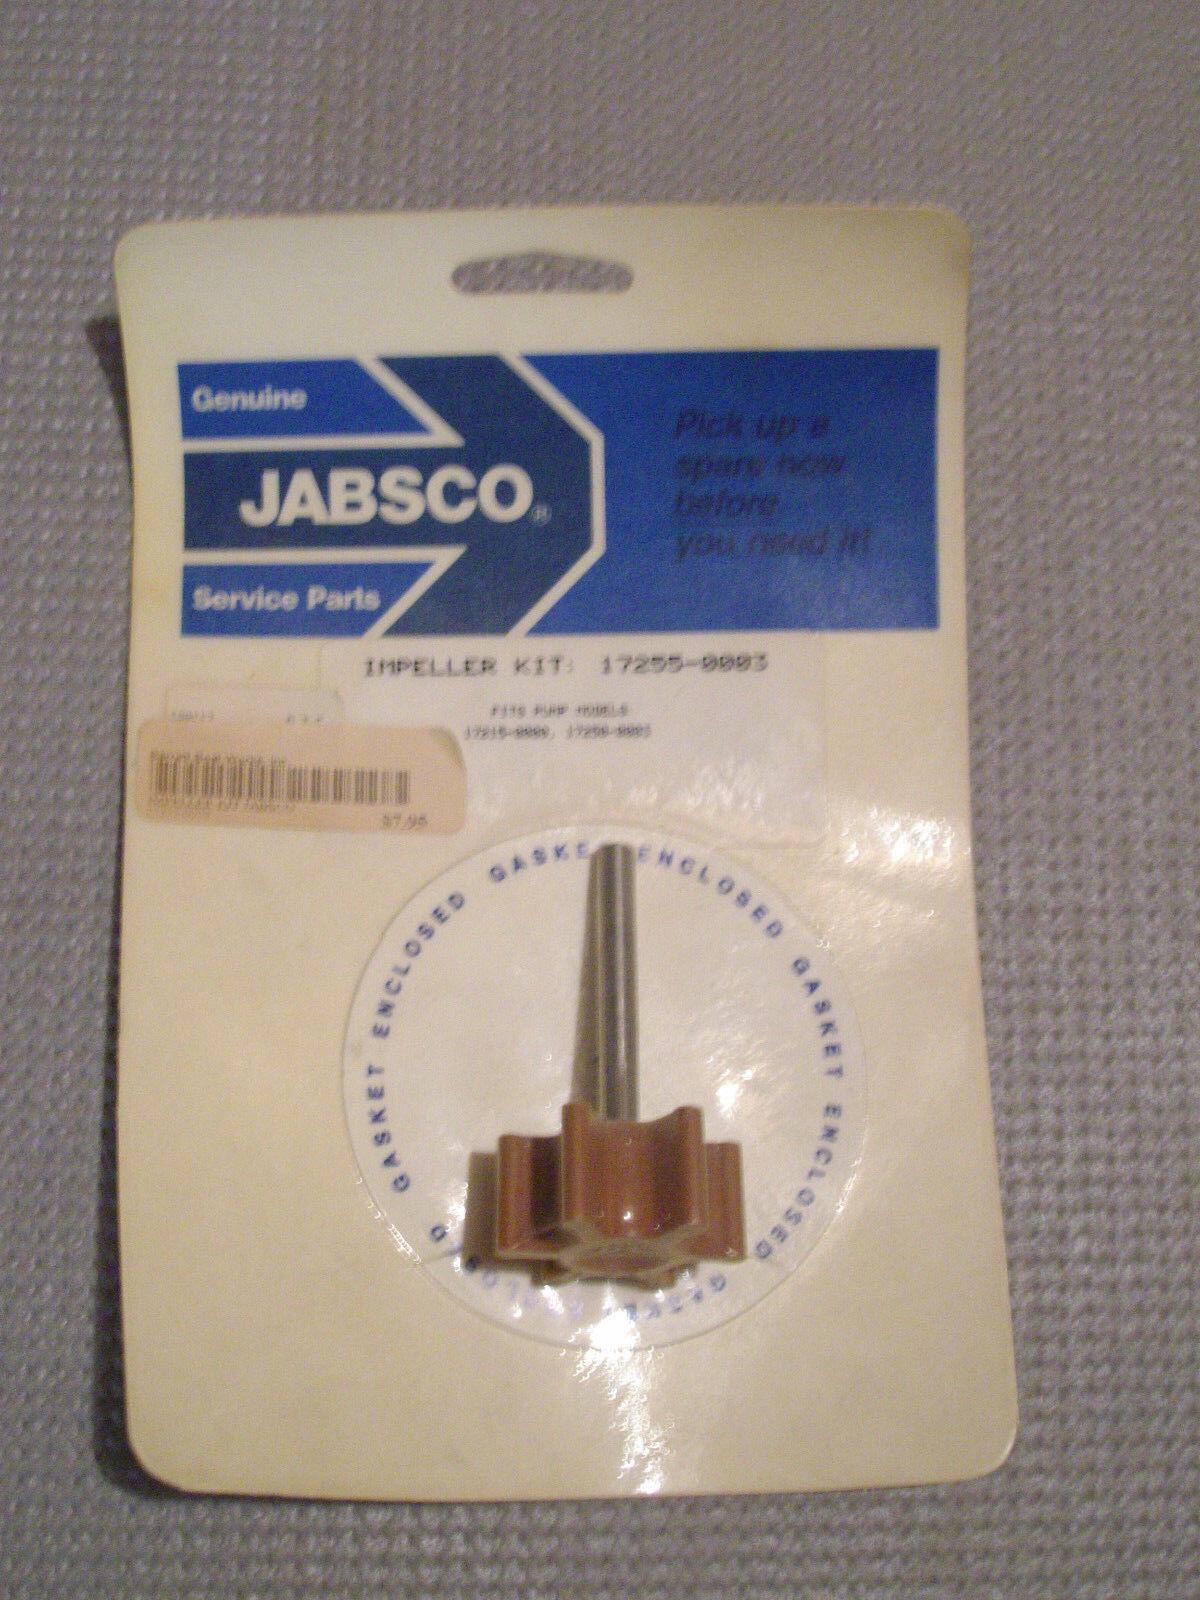 NOS OEM Jabsco 17255-0001 Impeller Kit Shaft Profile D Pump Marine B